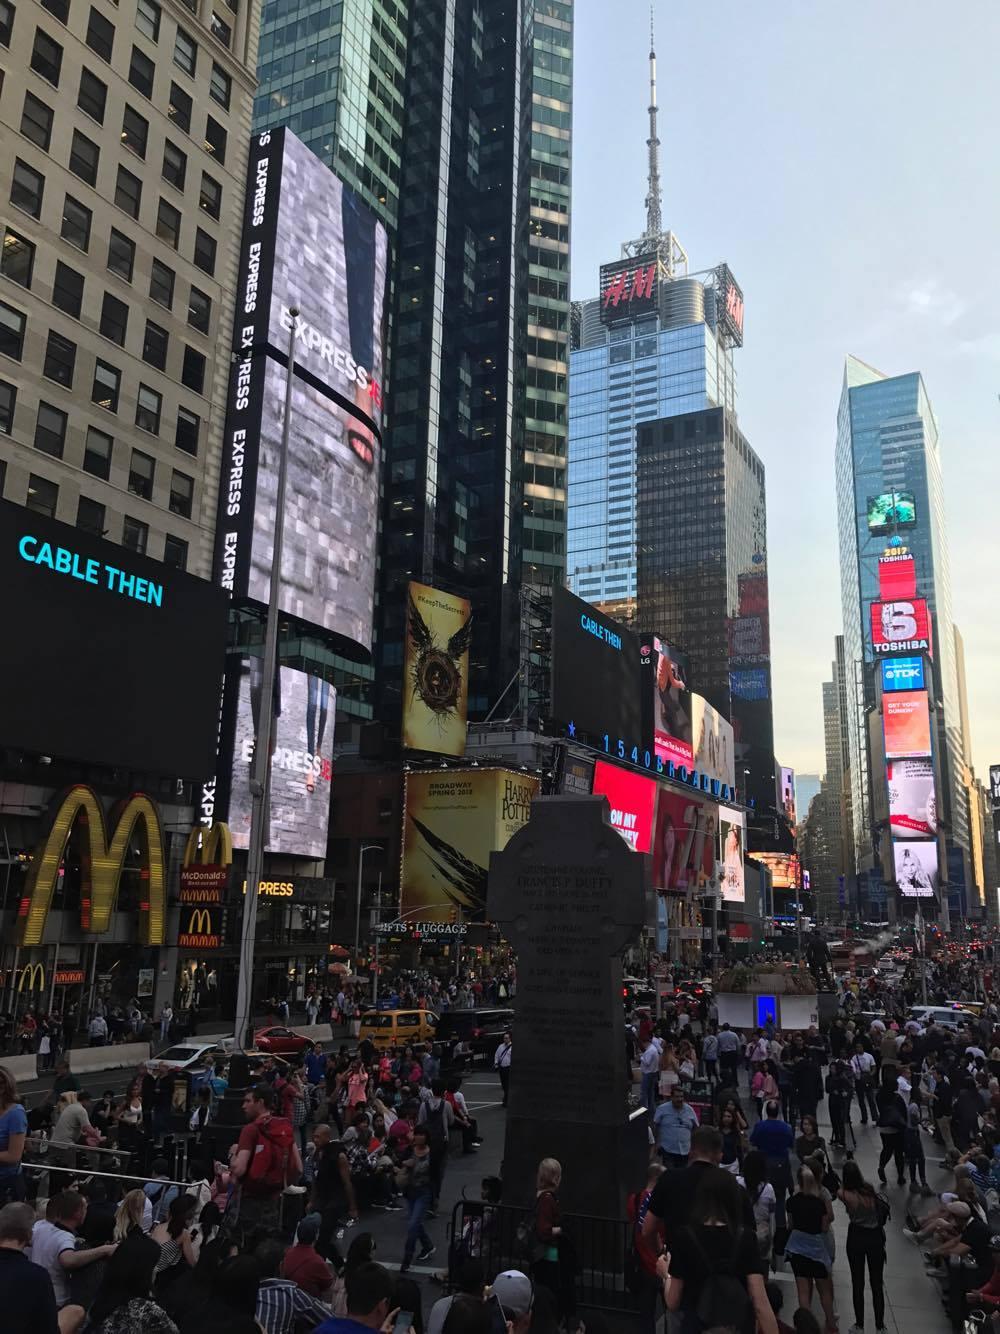 Galna Times Square